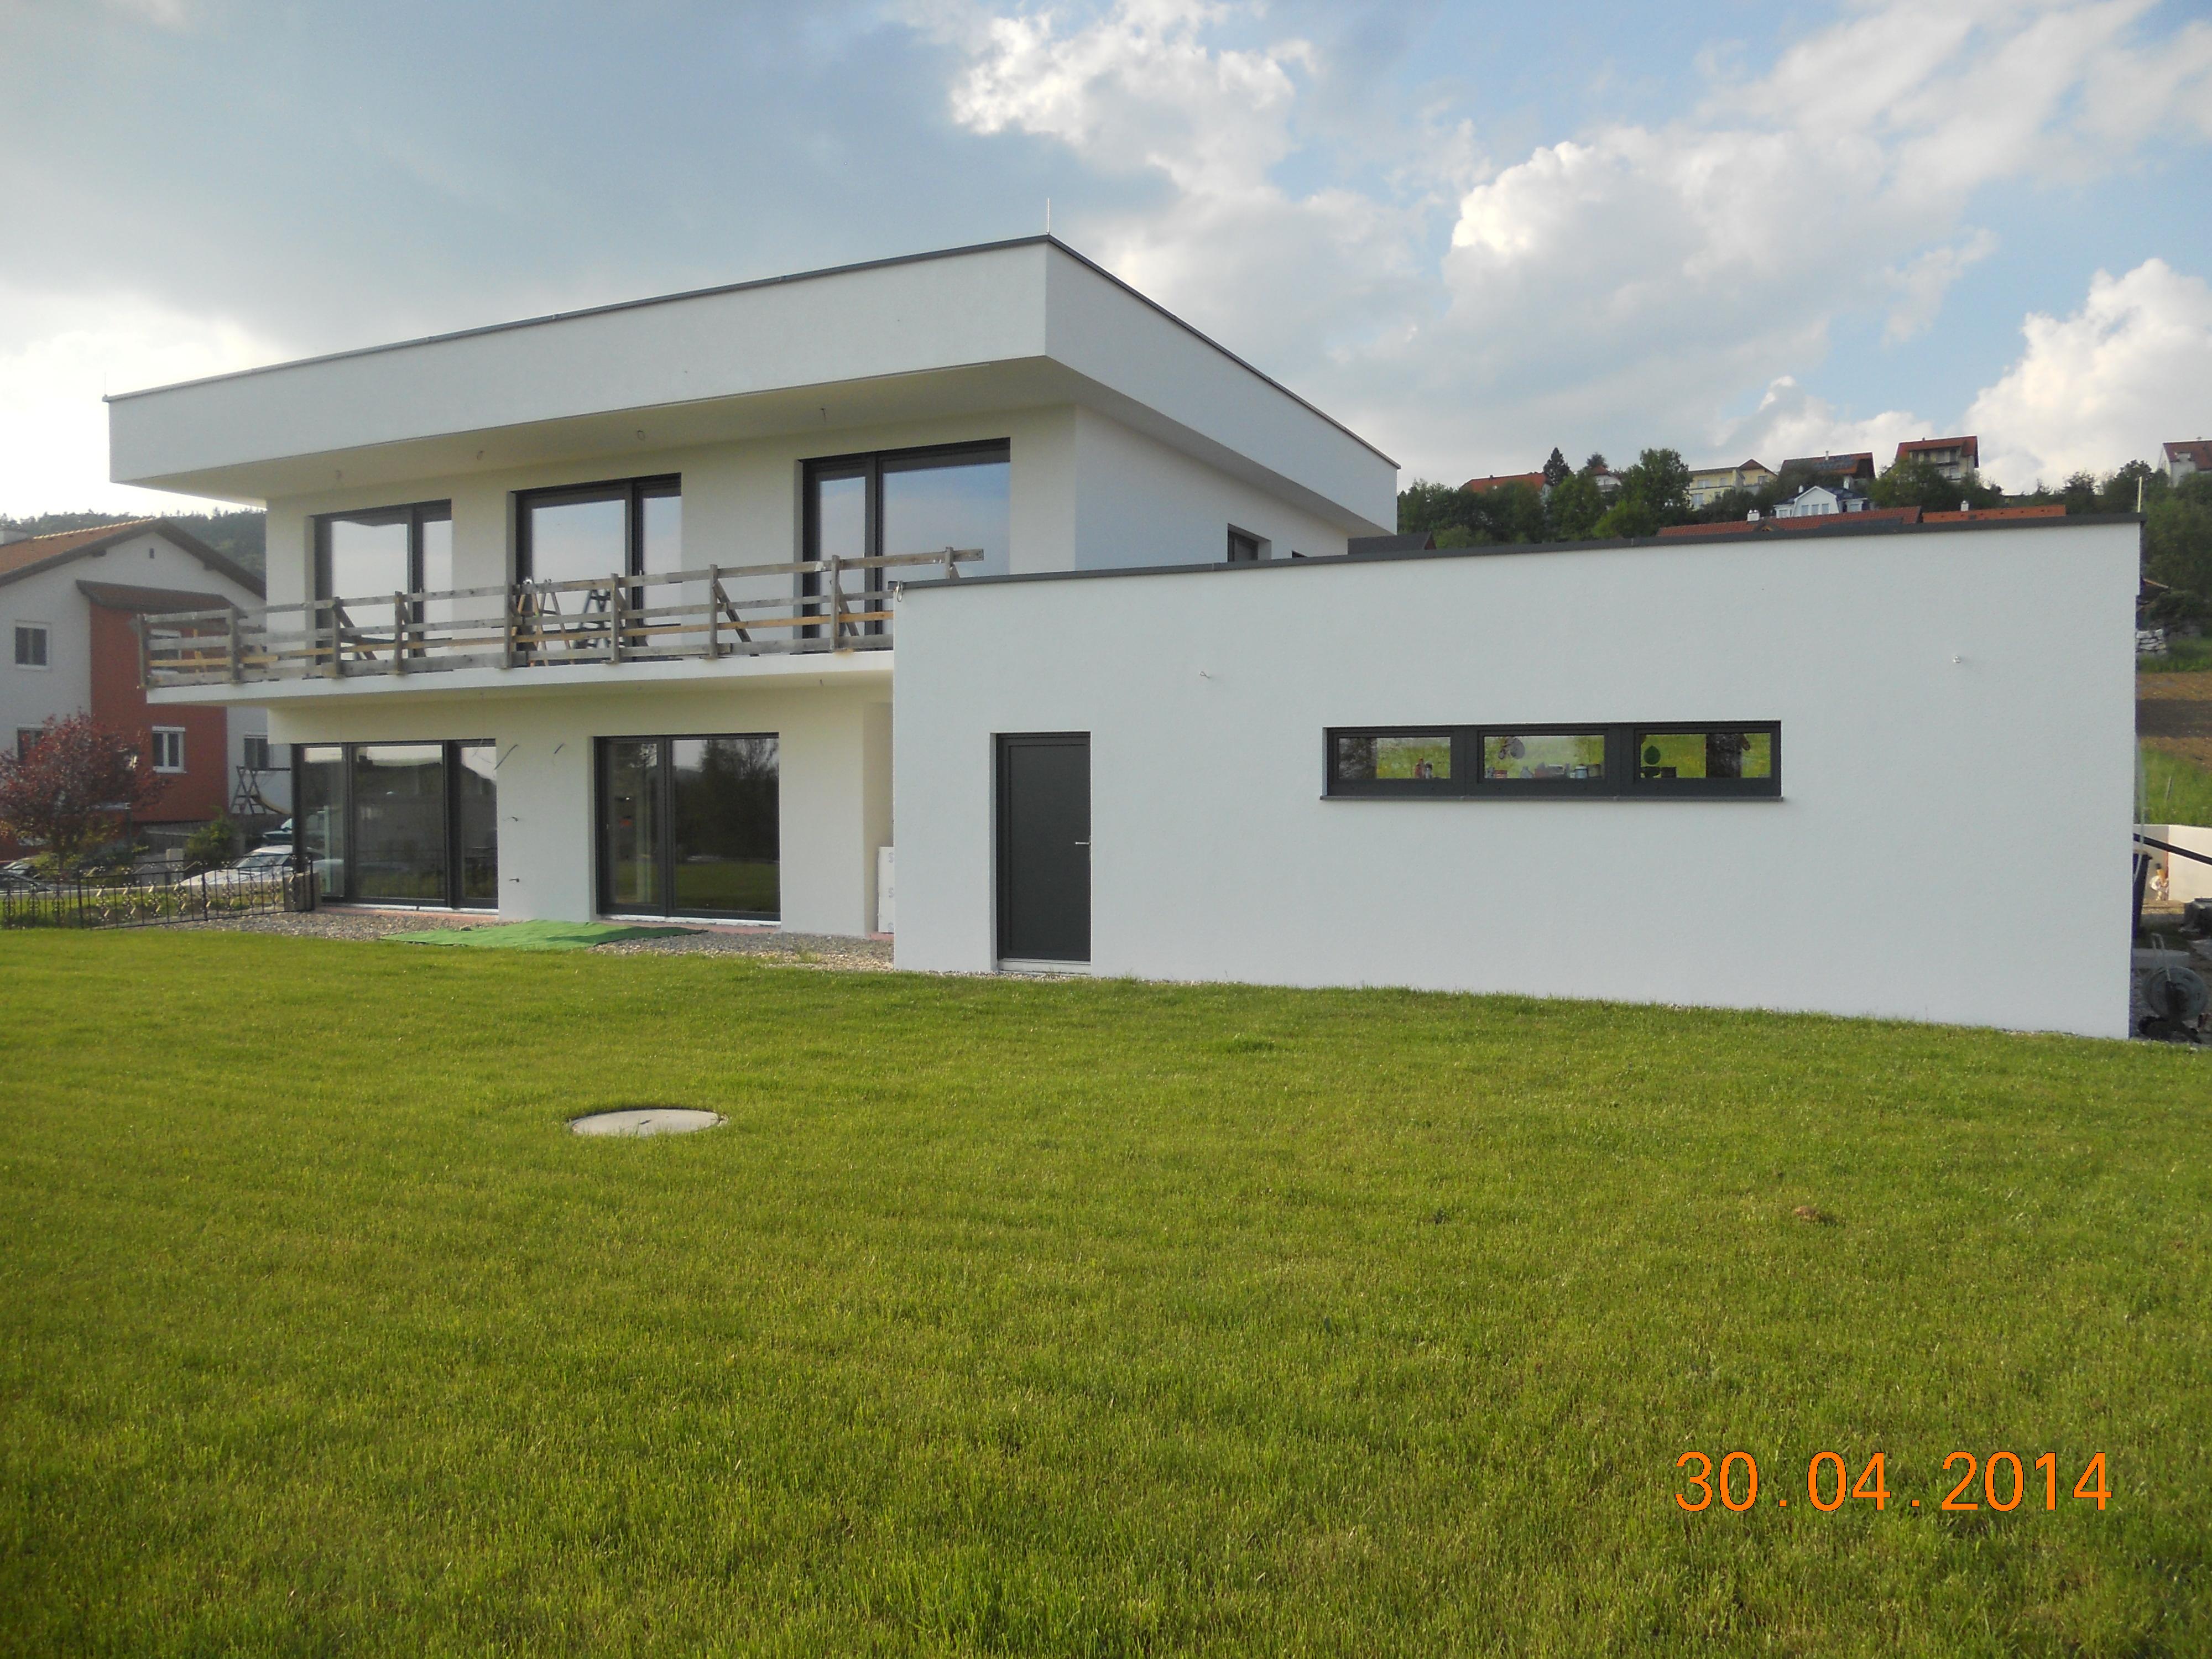 Einfamilienhaus NCH - Neubau